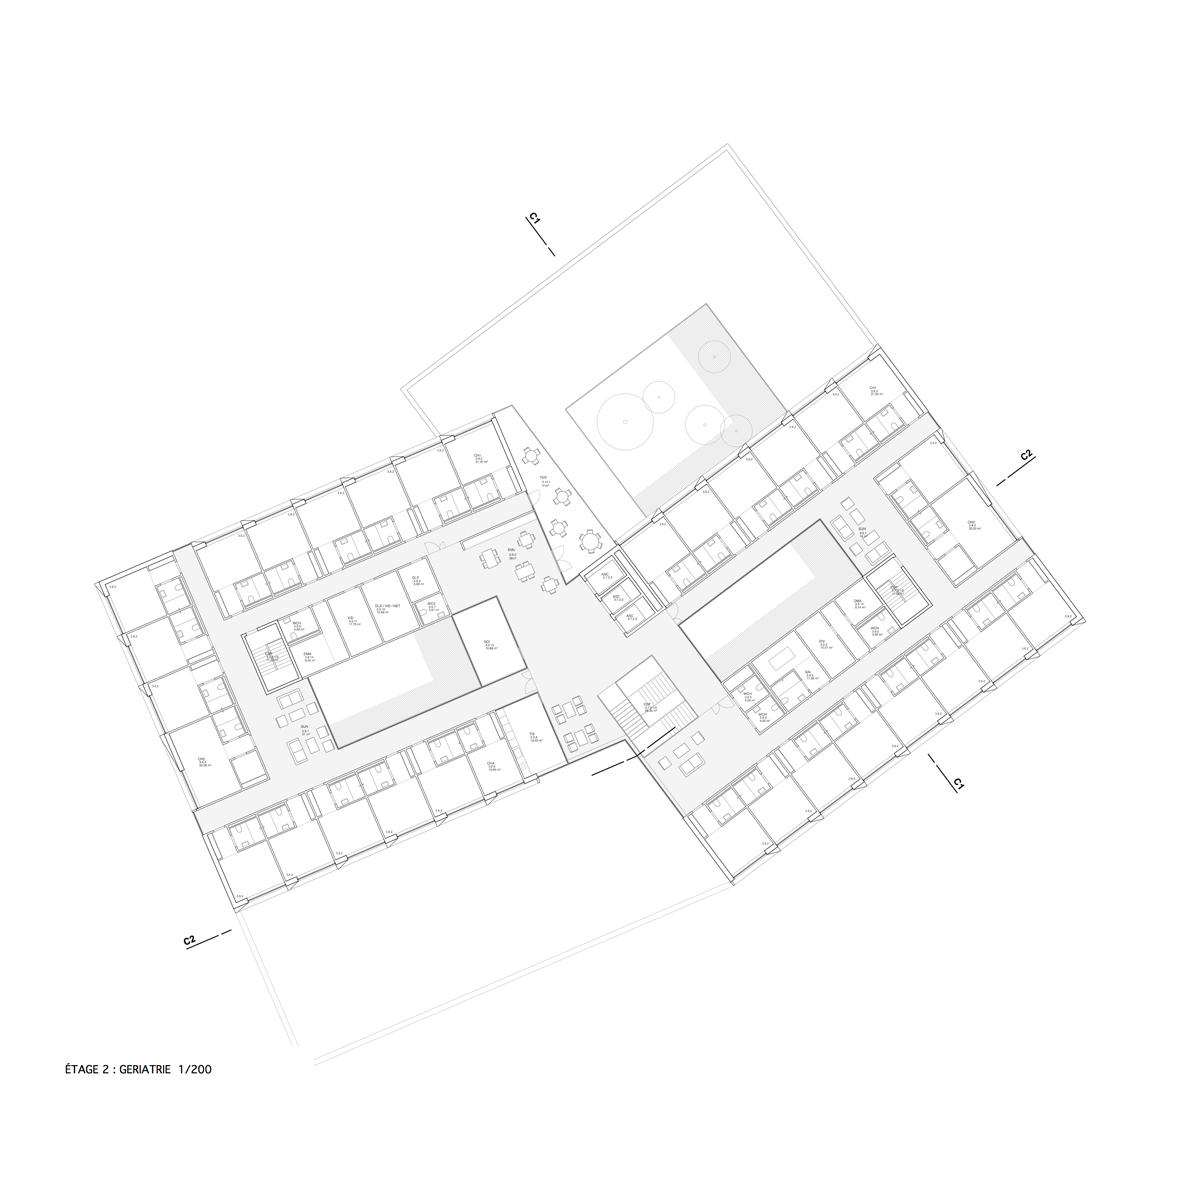 PDF_12-037_EMS_SAINT-CROIX_02.jpg